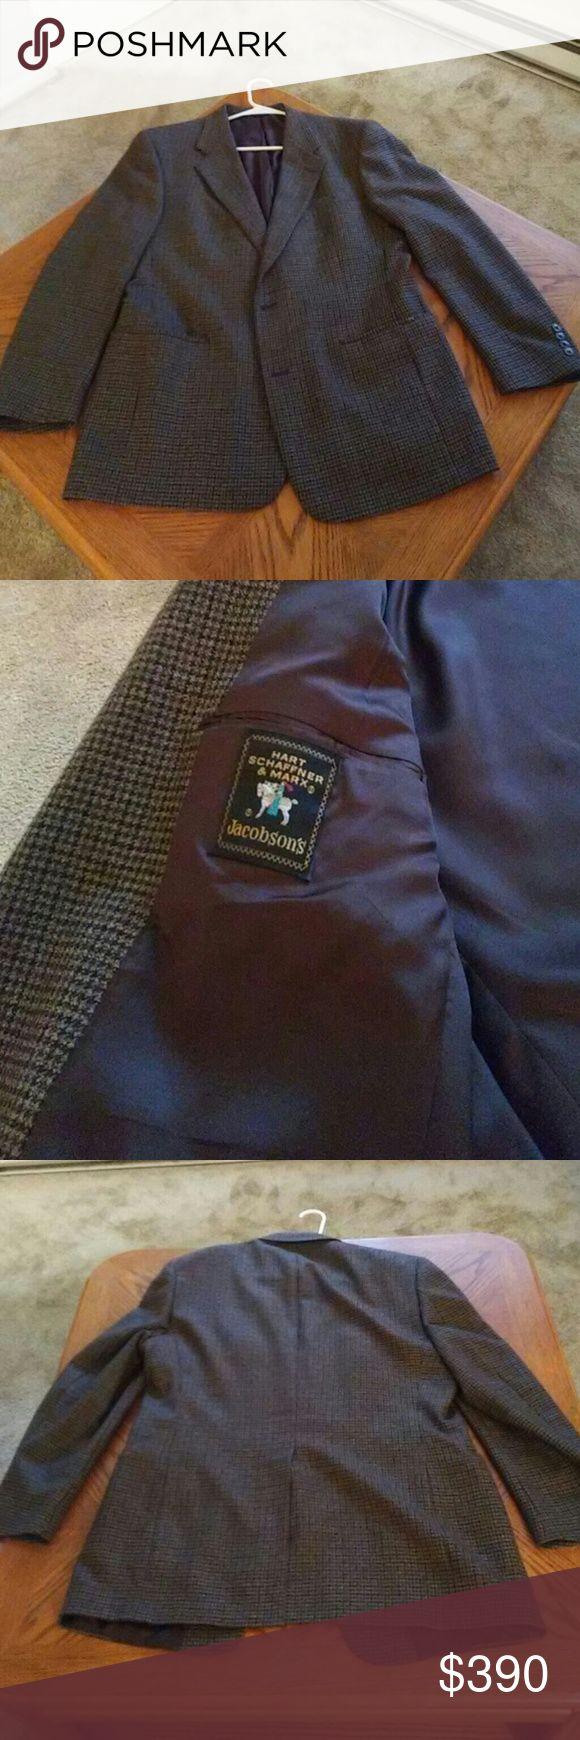 Hart Schaffner & Marx men's sports jacket Plaid high quality sports jacket Hart Schaffner Marx Suits & Blazers Sport Coats & Blazers